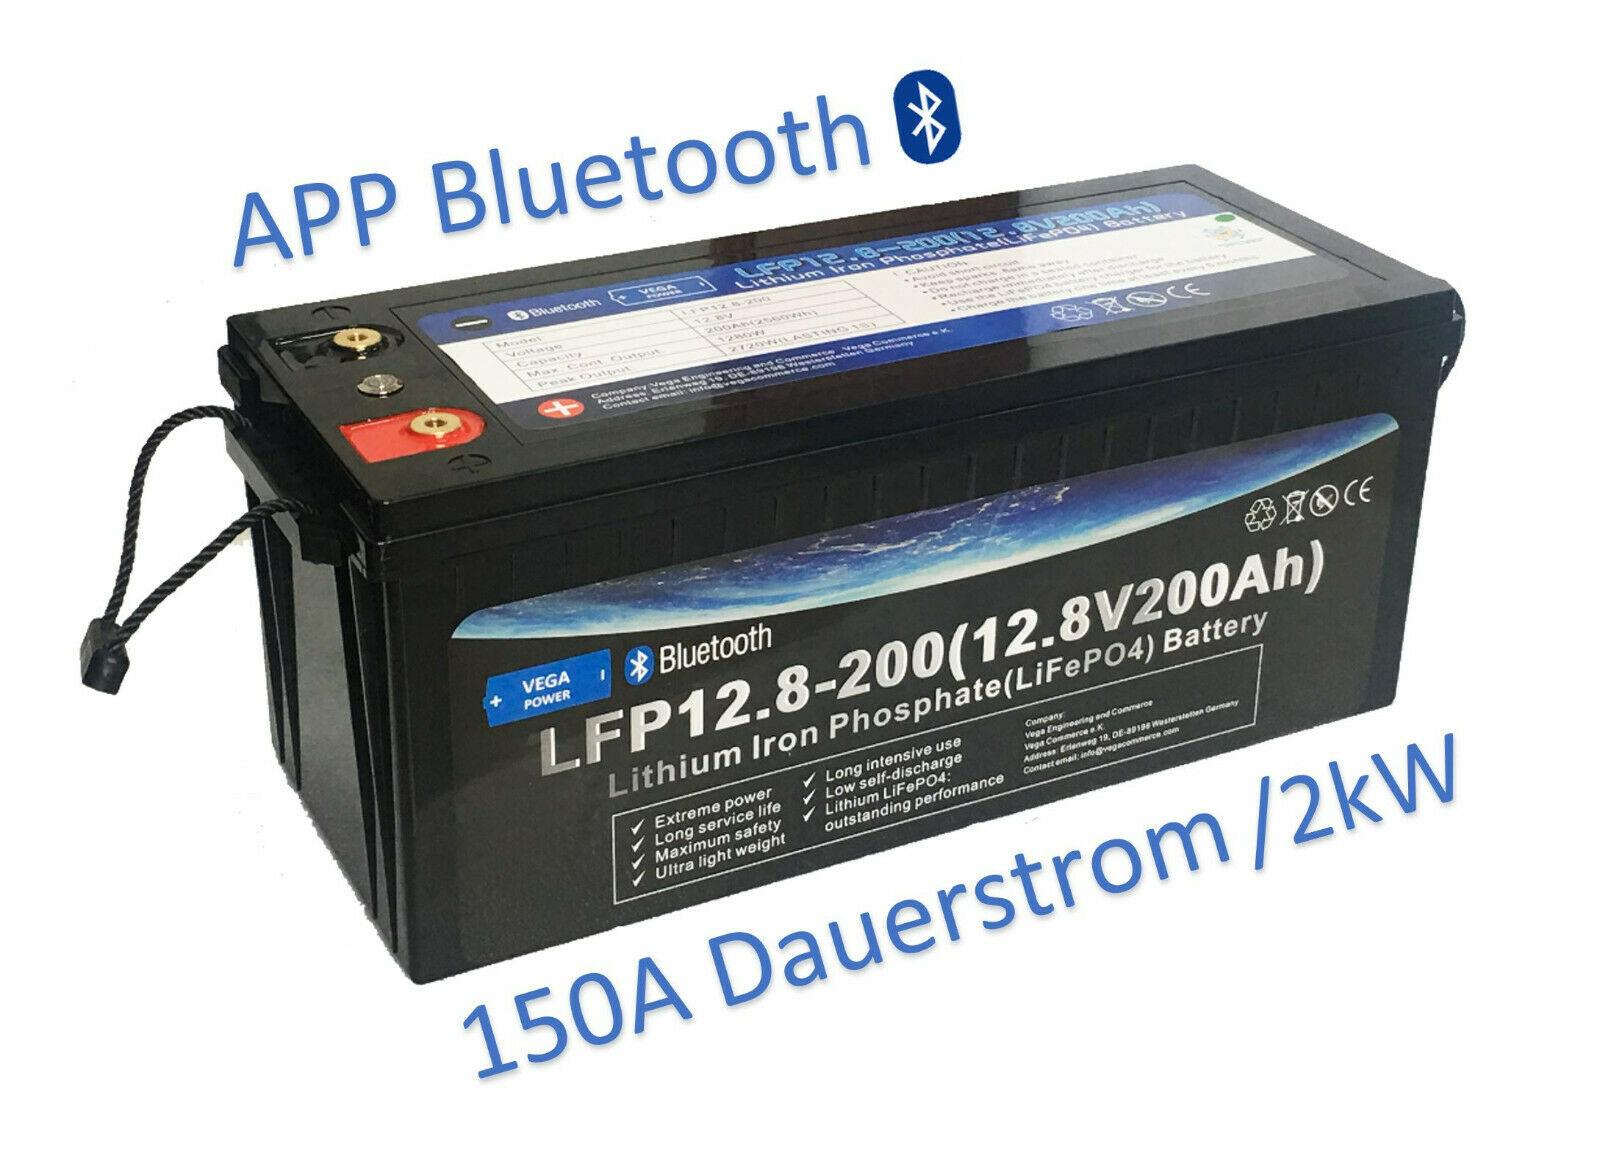 12V-200Ah-LiFePO4-Lithium Eisen Phosphat-Akku-Wohnmobil-Wagen